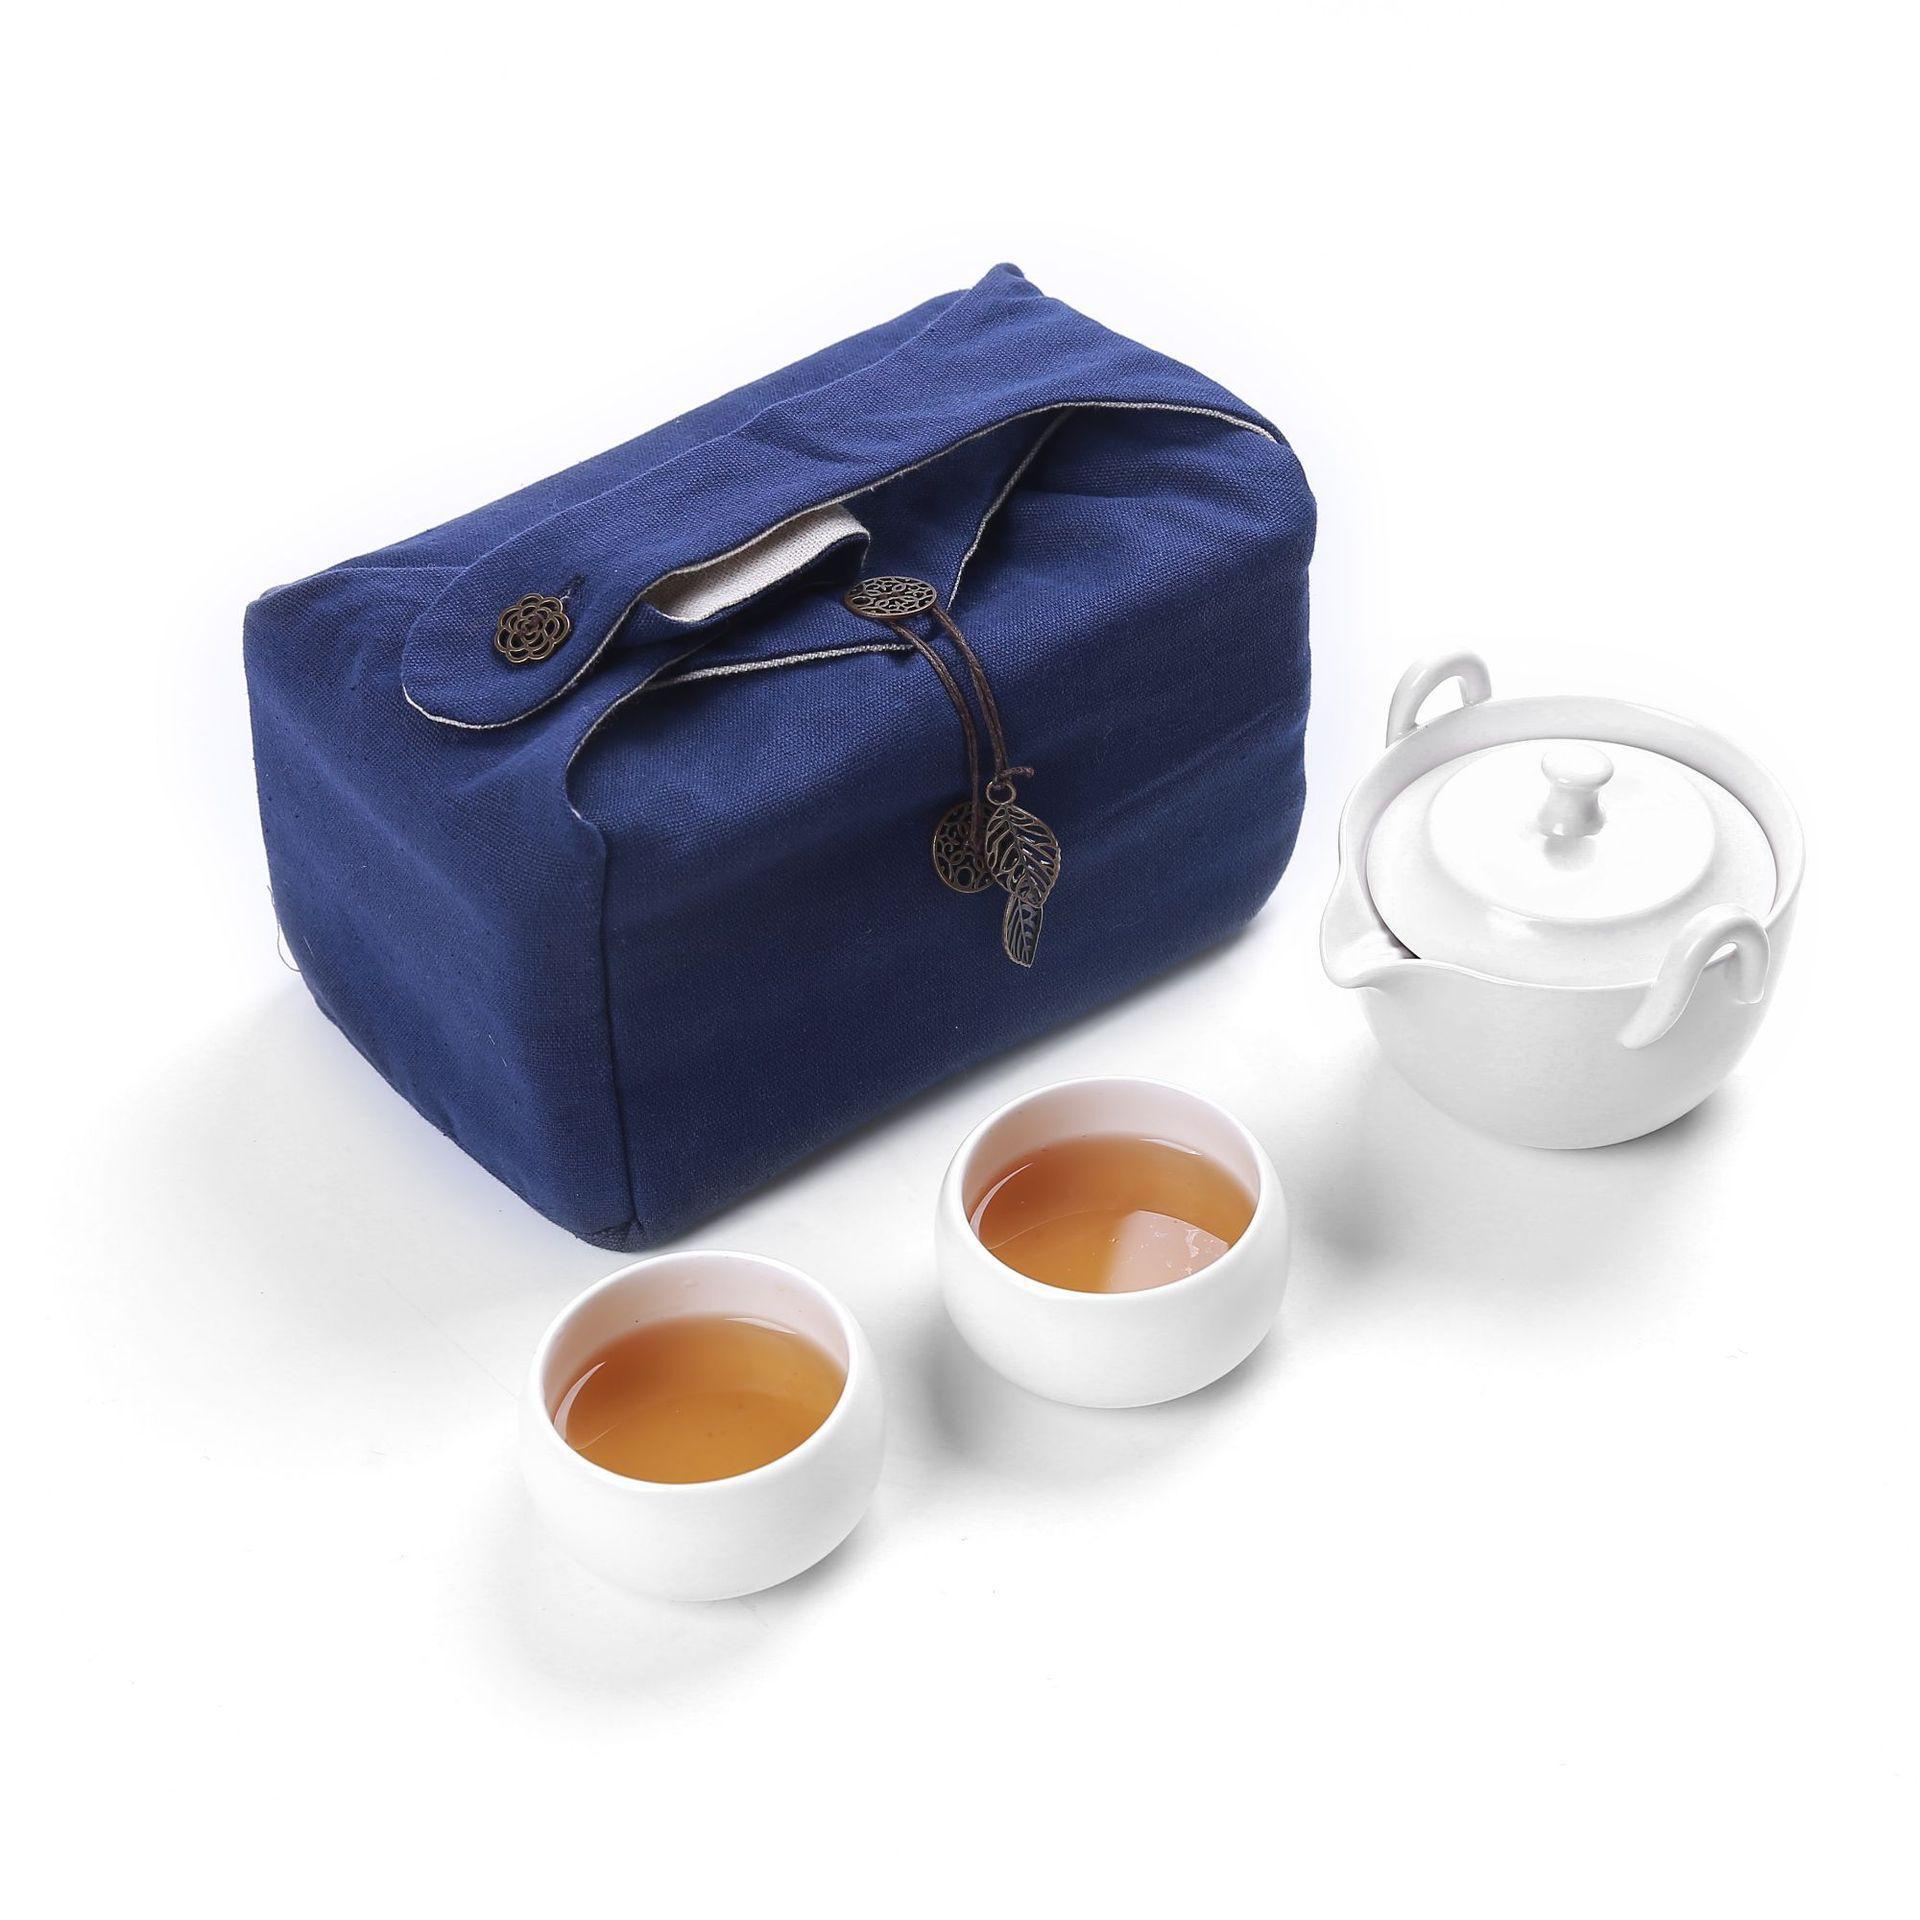 Drinkware Coffee Tea Sets Ceramic Gaiwan Teapot Kettle Teacup Porcelain Portable Travel Tea Set Chinese Kung Fu Tea Set